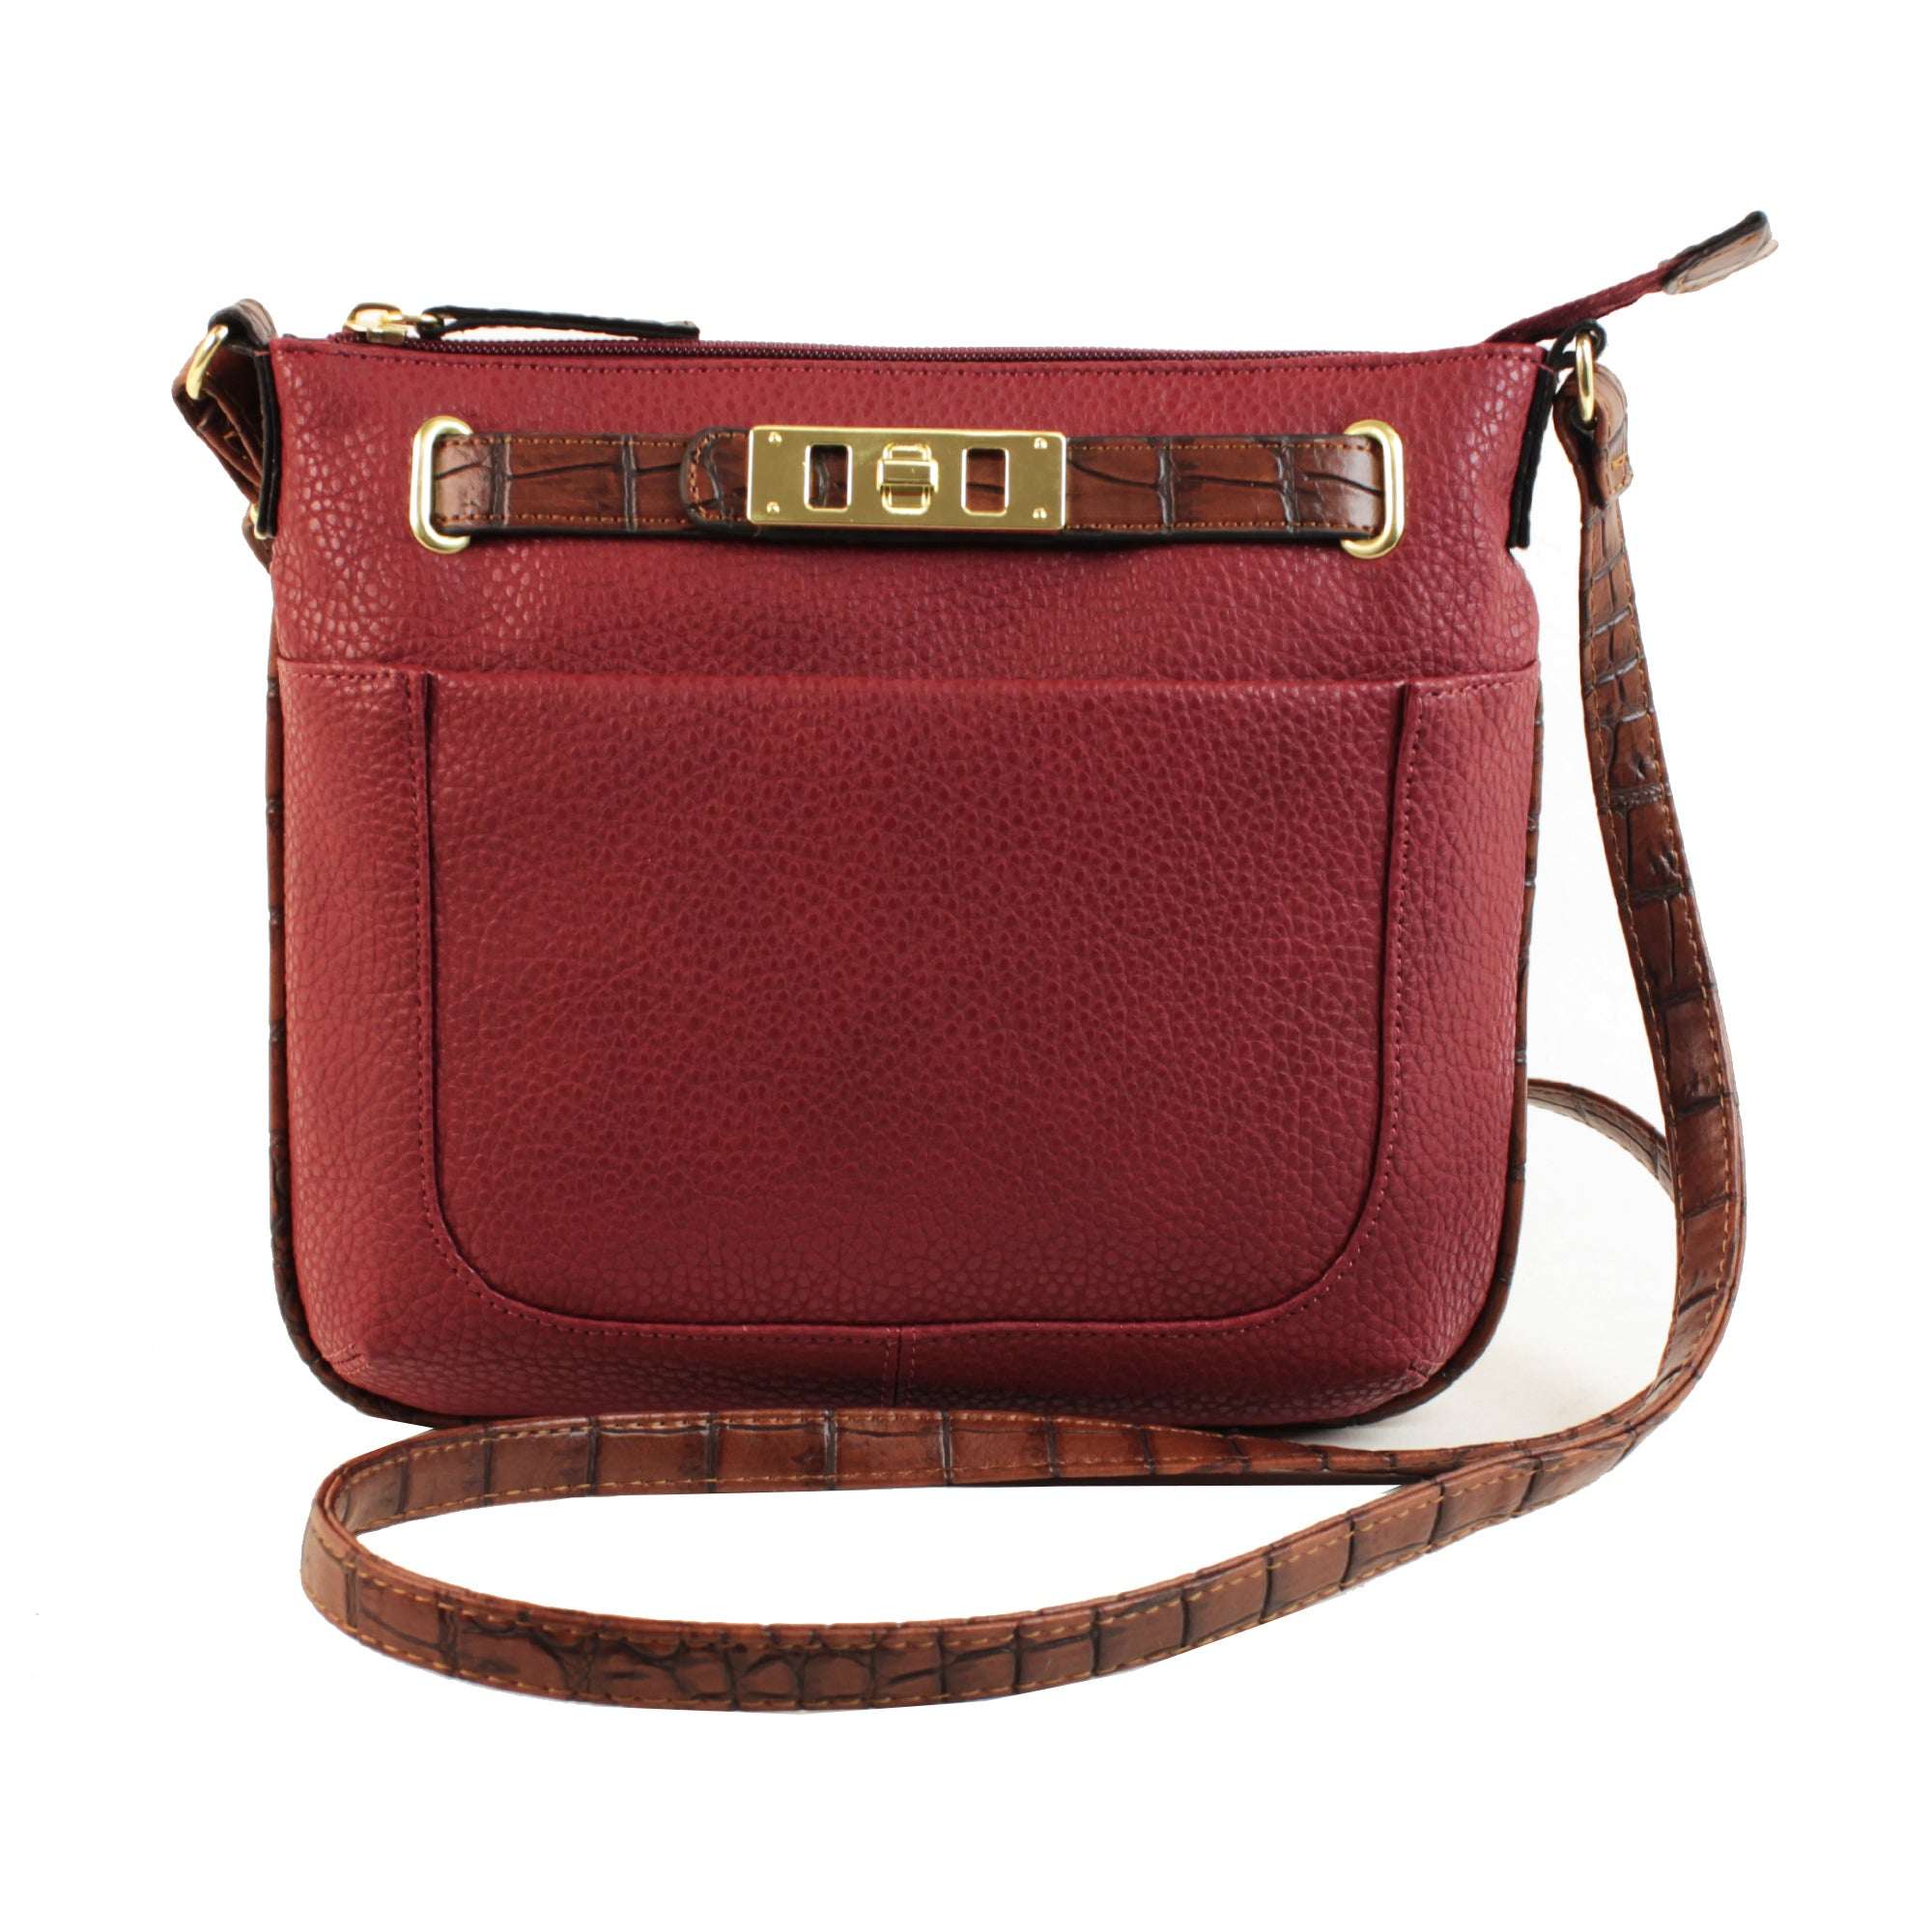 Emilie M. Elaina Women's PVC Crossbody Bag